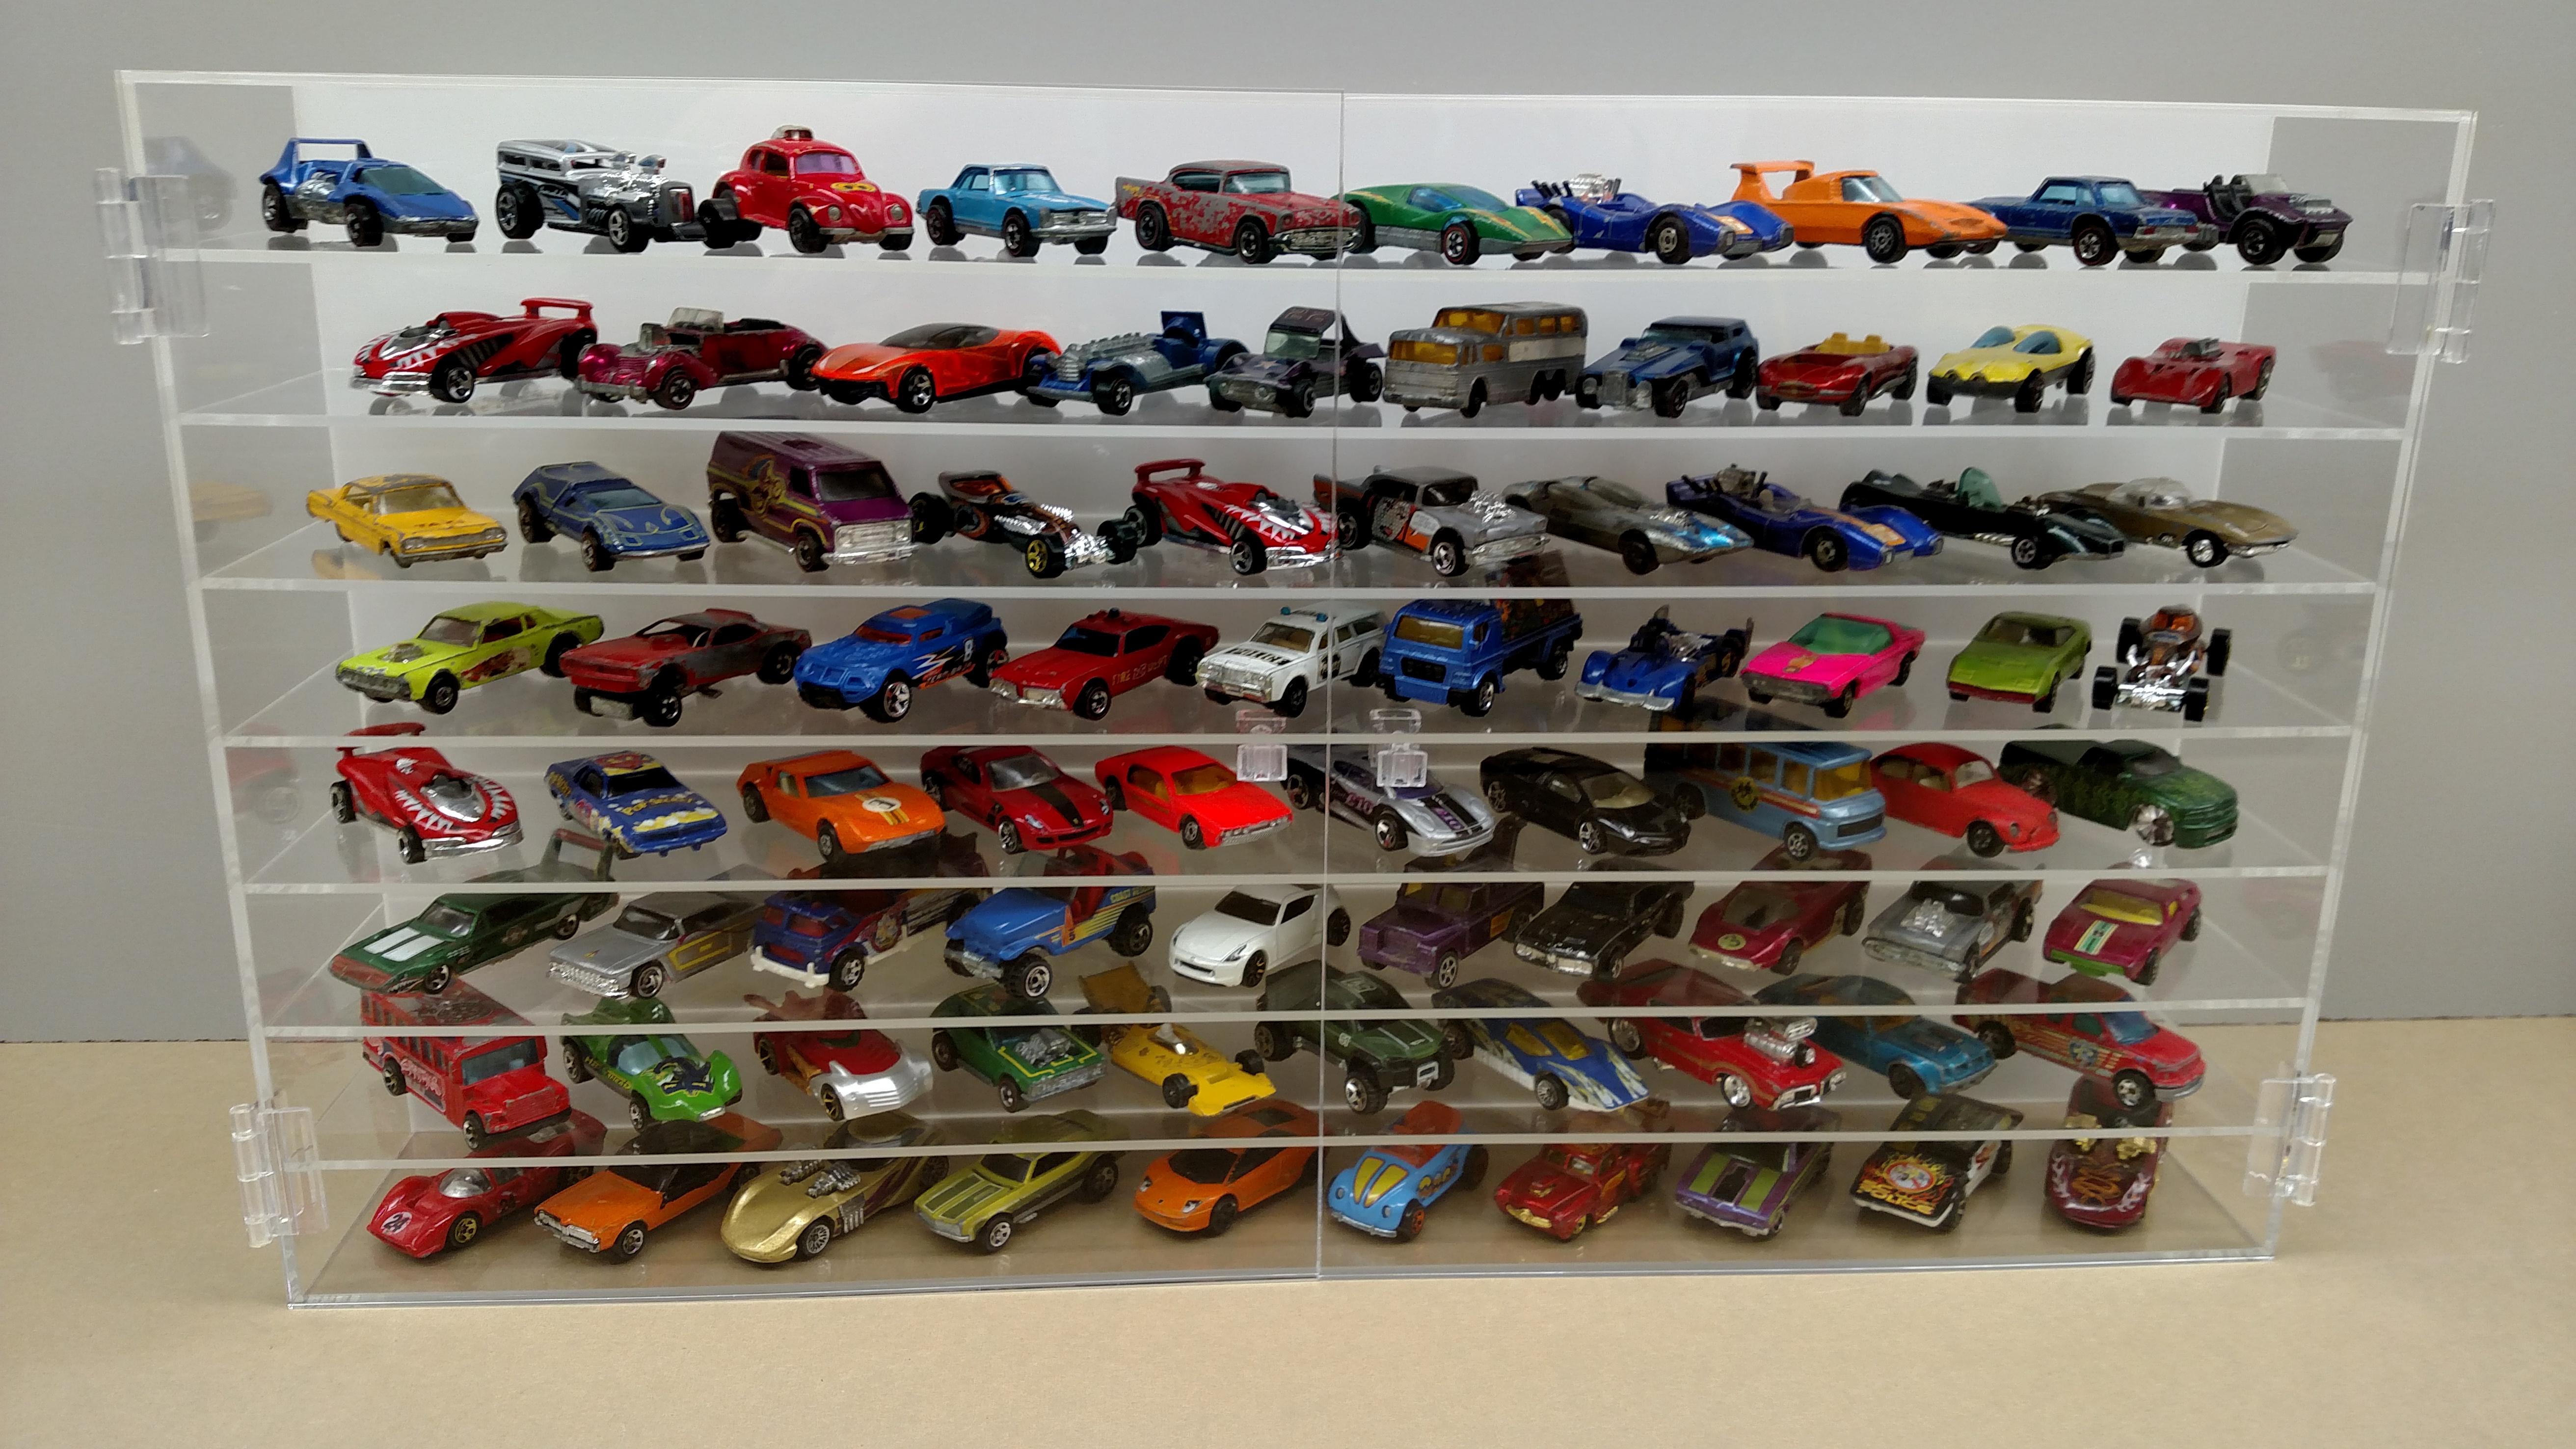 Nascar Case Hot Wheels Protective Display Cases Bullseye Plastics